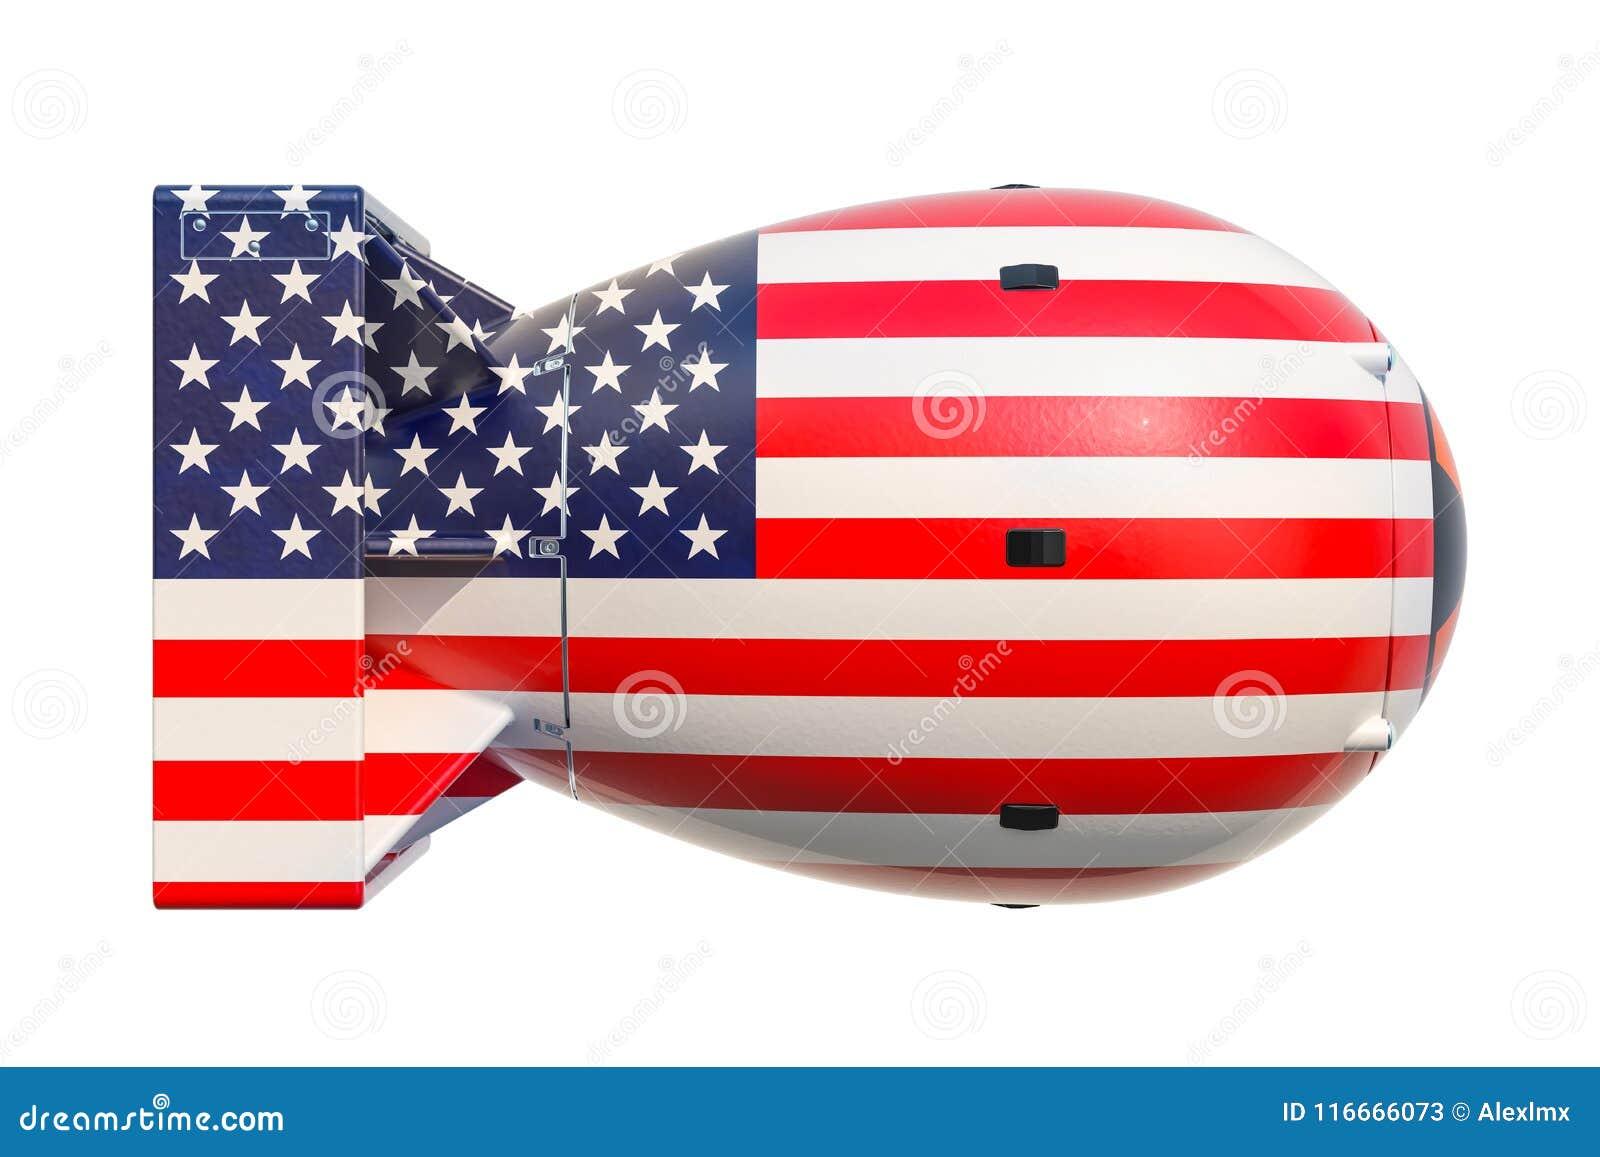 USA jądrowej broni pojęcie, 3D rendering